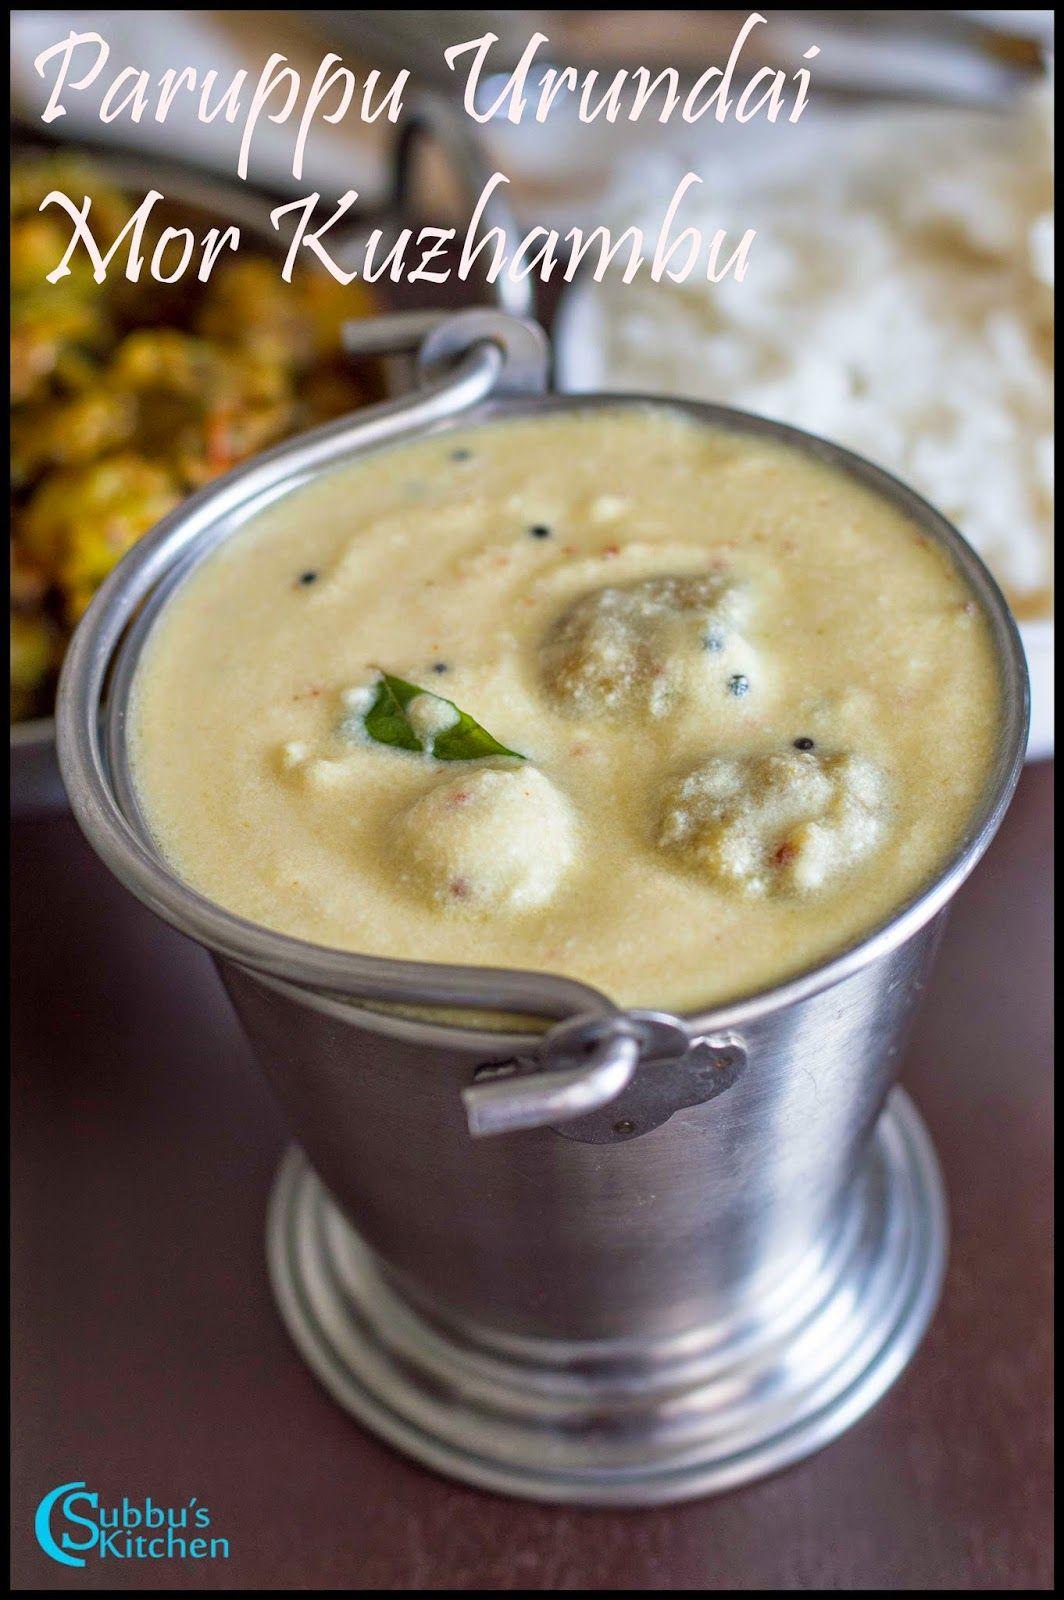 Paruppu Urundai Mor Kuzhambu Recipe Recipes Yogurt Curry Vegetarian Recipes